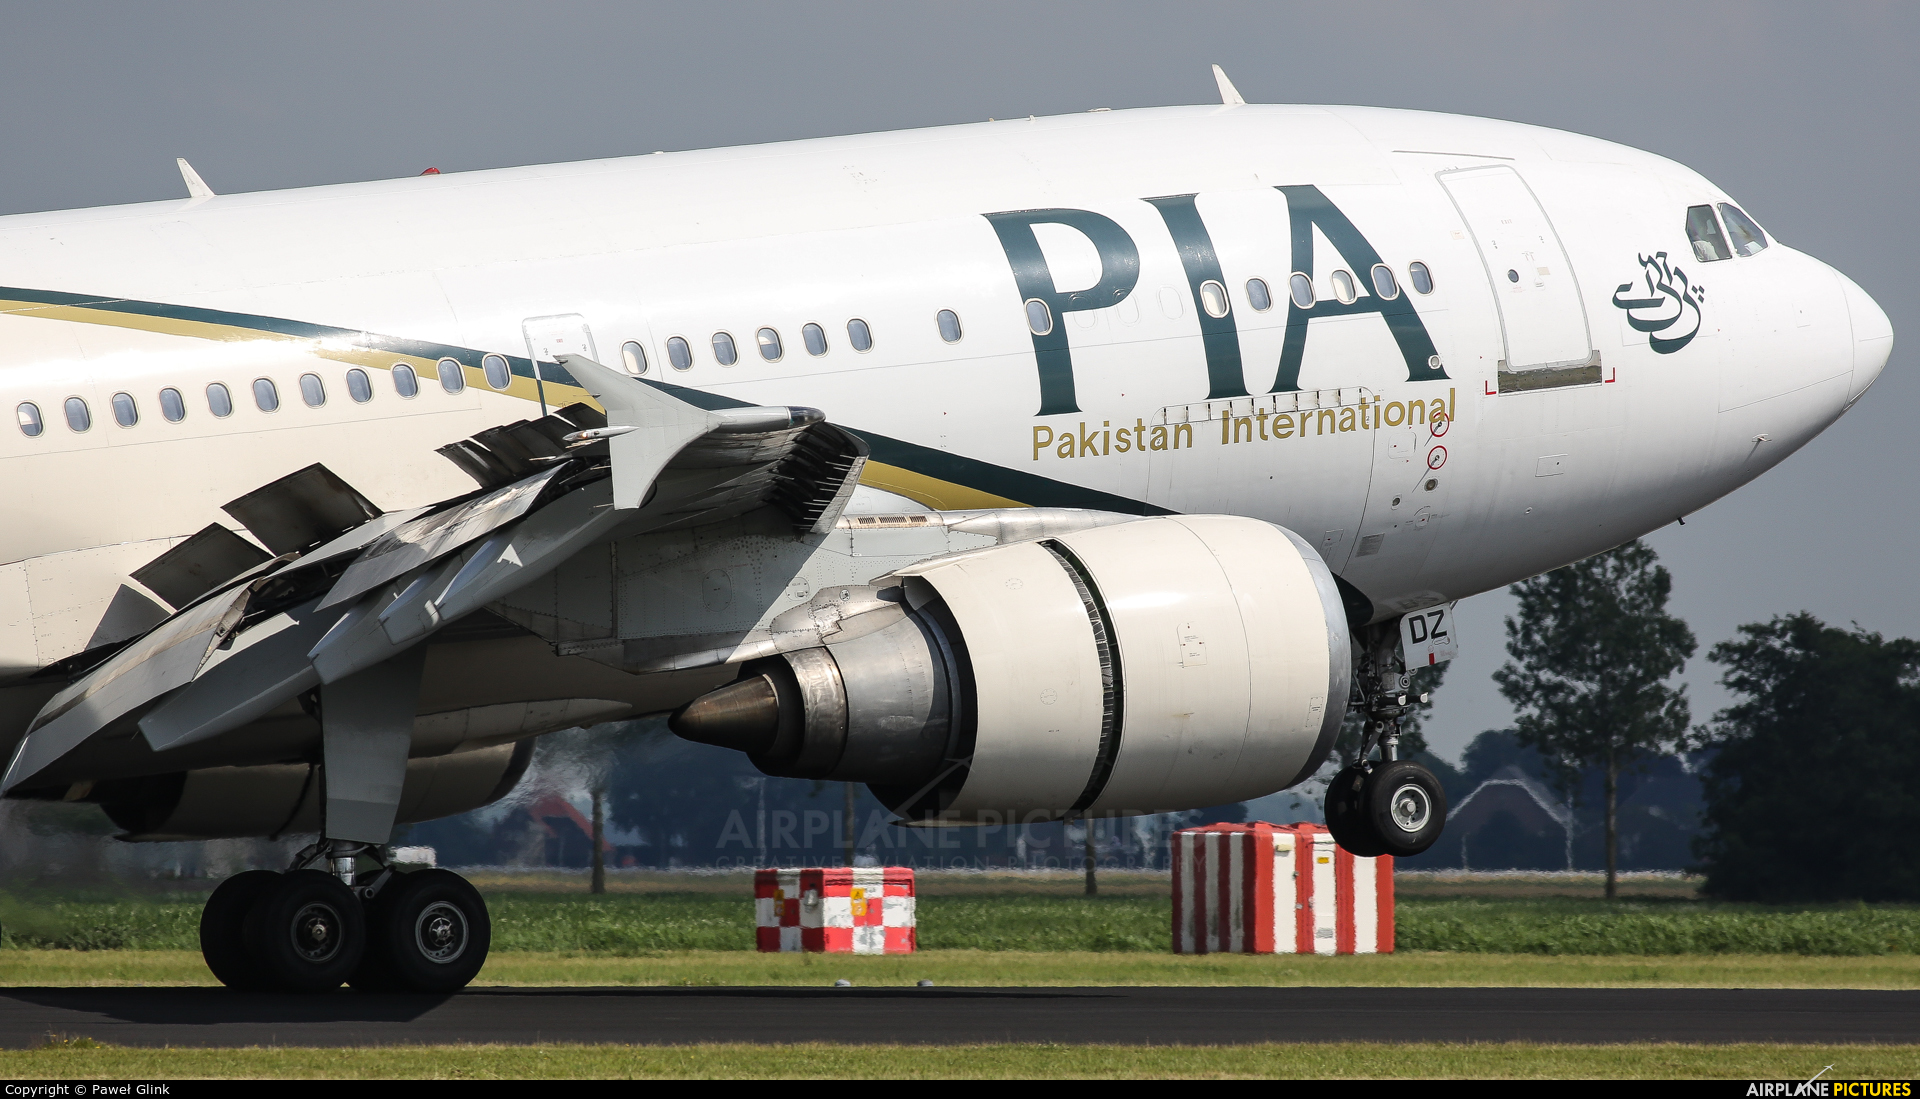 PIA - Pakistan International Airlines AP-BDZ aircraft at Amsterdam - Schiphol